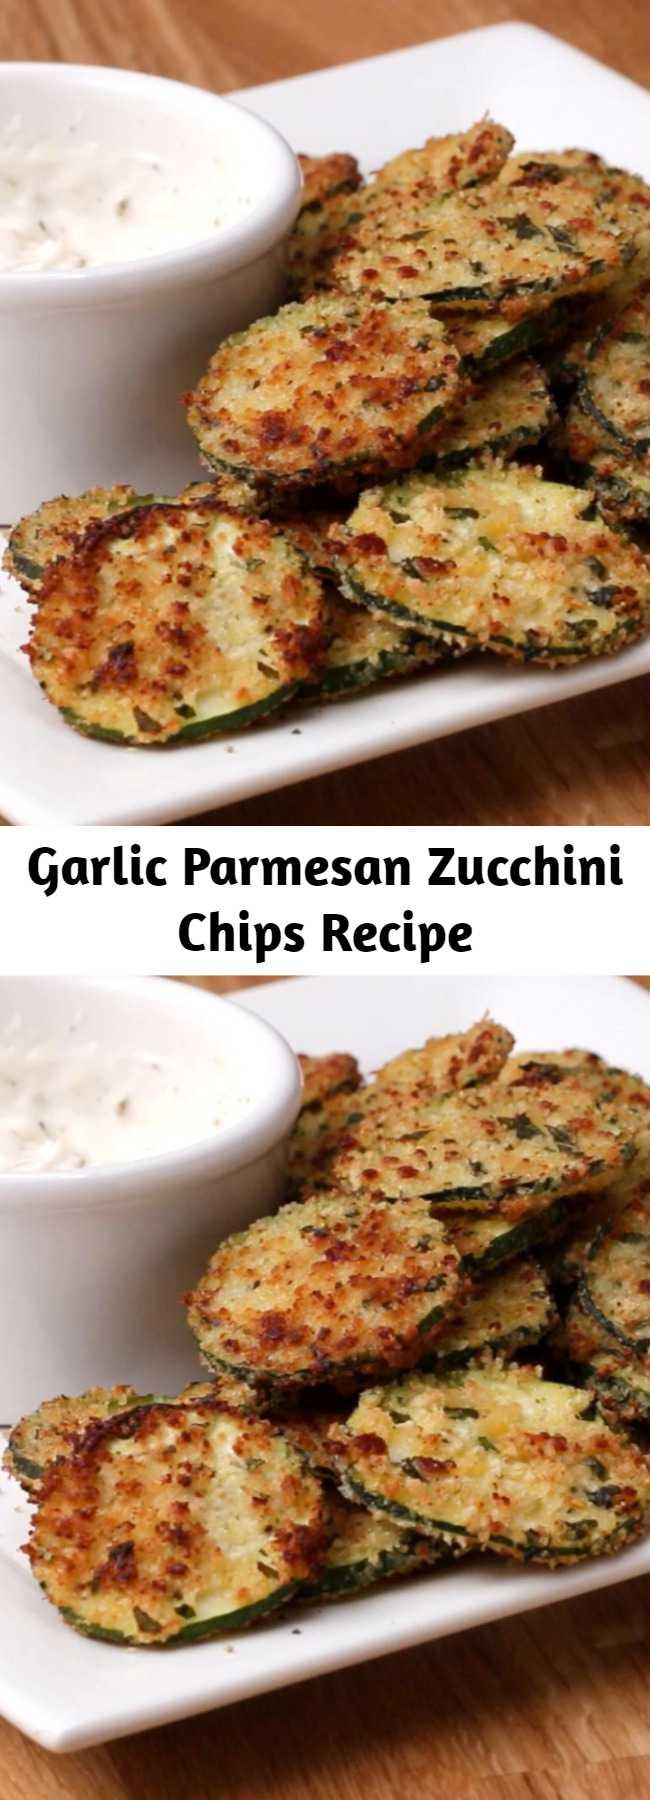 Garlic Parmesan Zucchini Chips Recipe